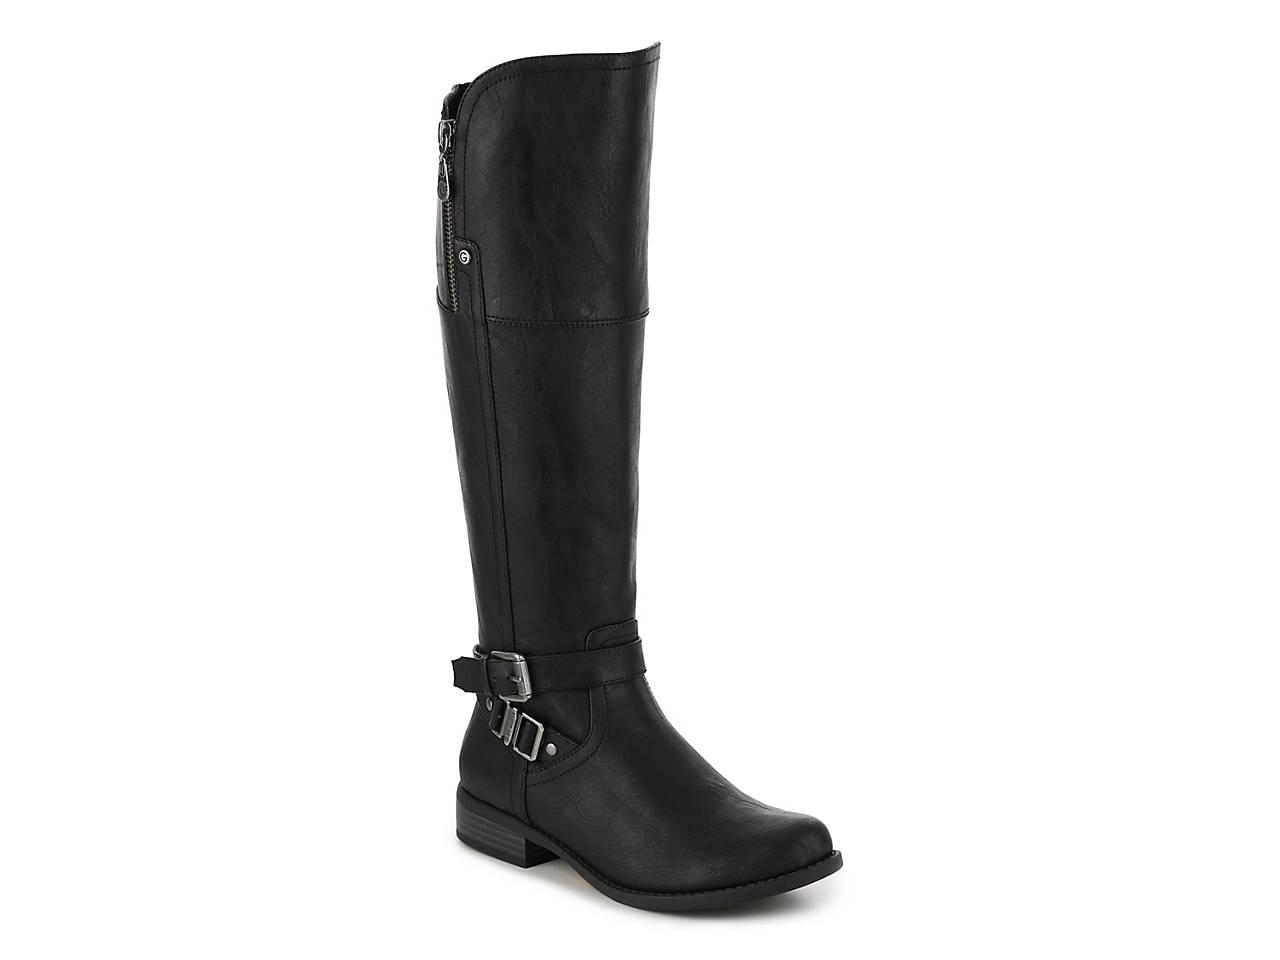 Heylow Riding Boot